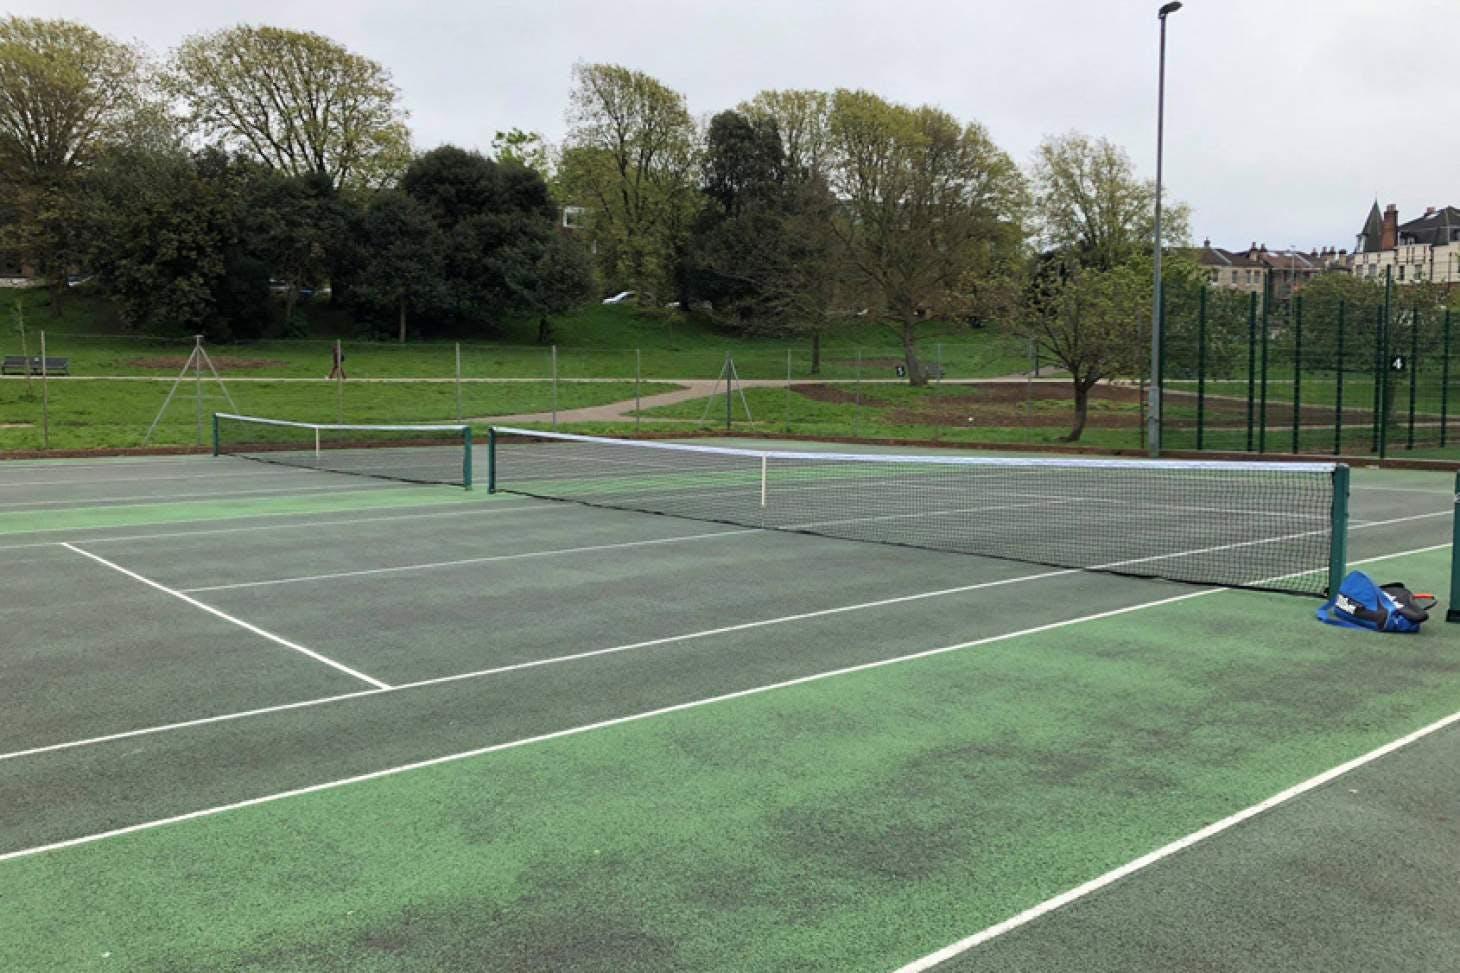 Queens Park Tennis Club Outdoor | Hard (macadam) tennis court